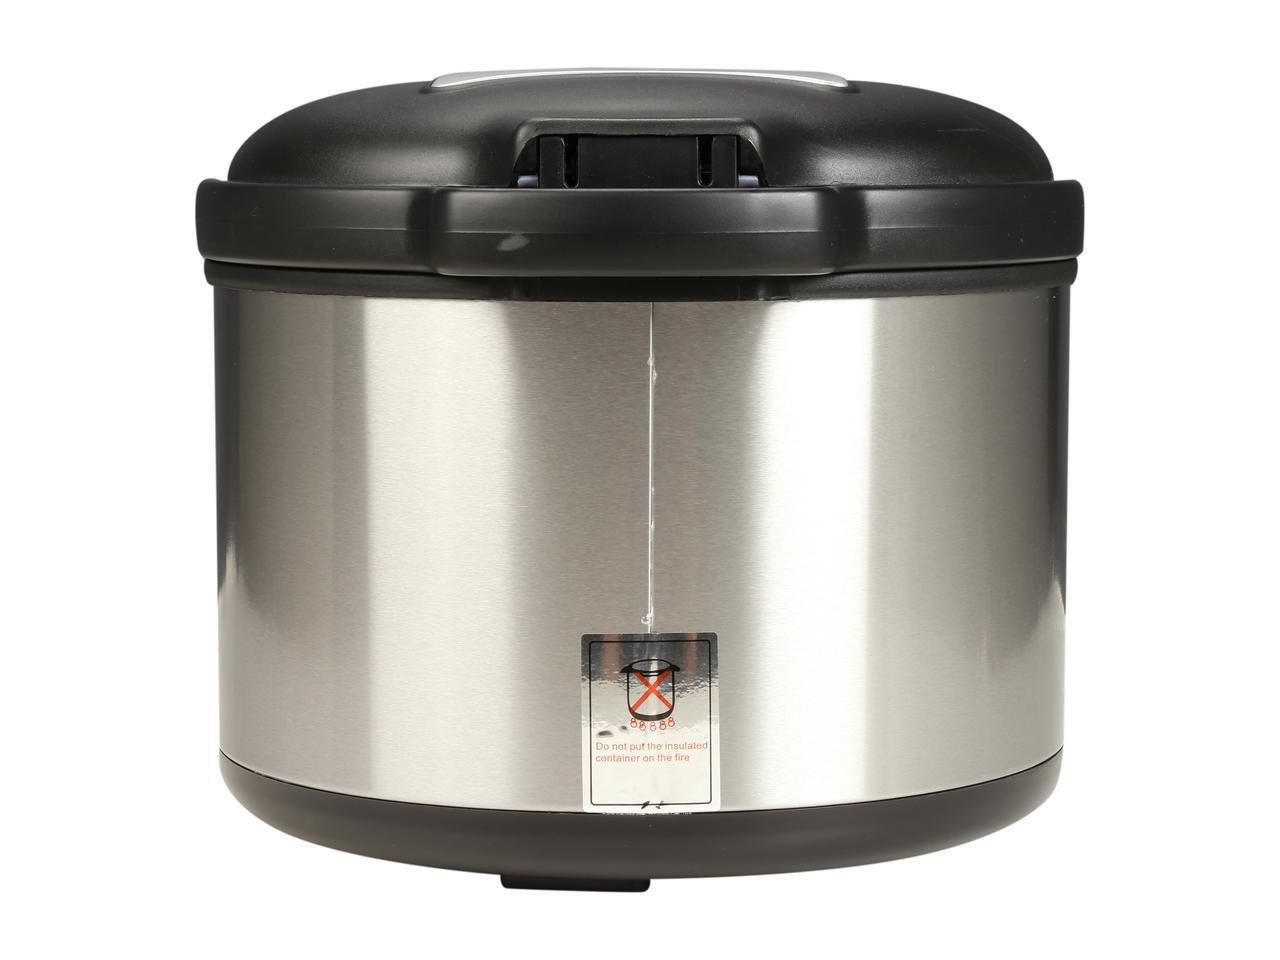 Tayama TXM-50CF Energy-Saving Thermal Cooker, 5 L, Black by TAYAMA (Image #5)